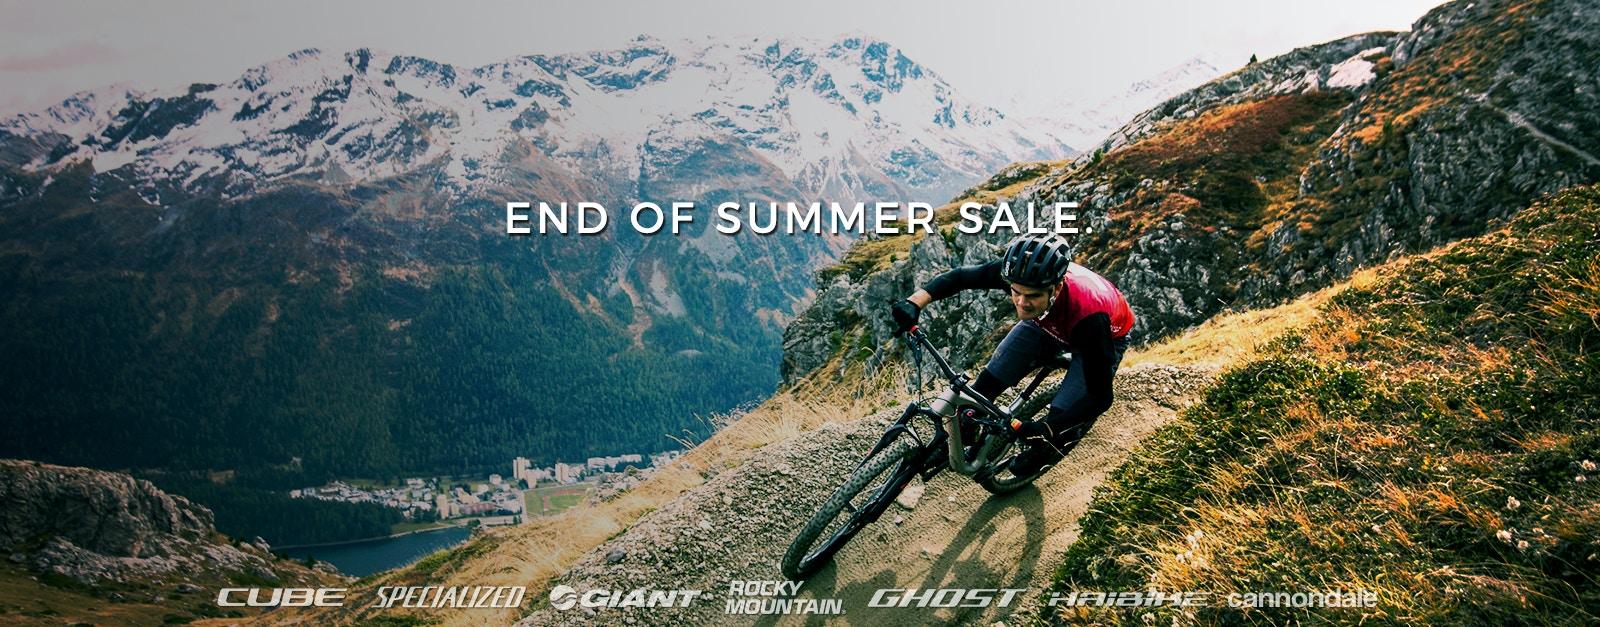 Fahrrad End of Summer Sale